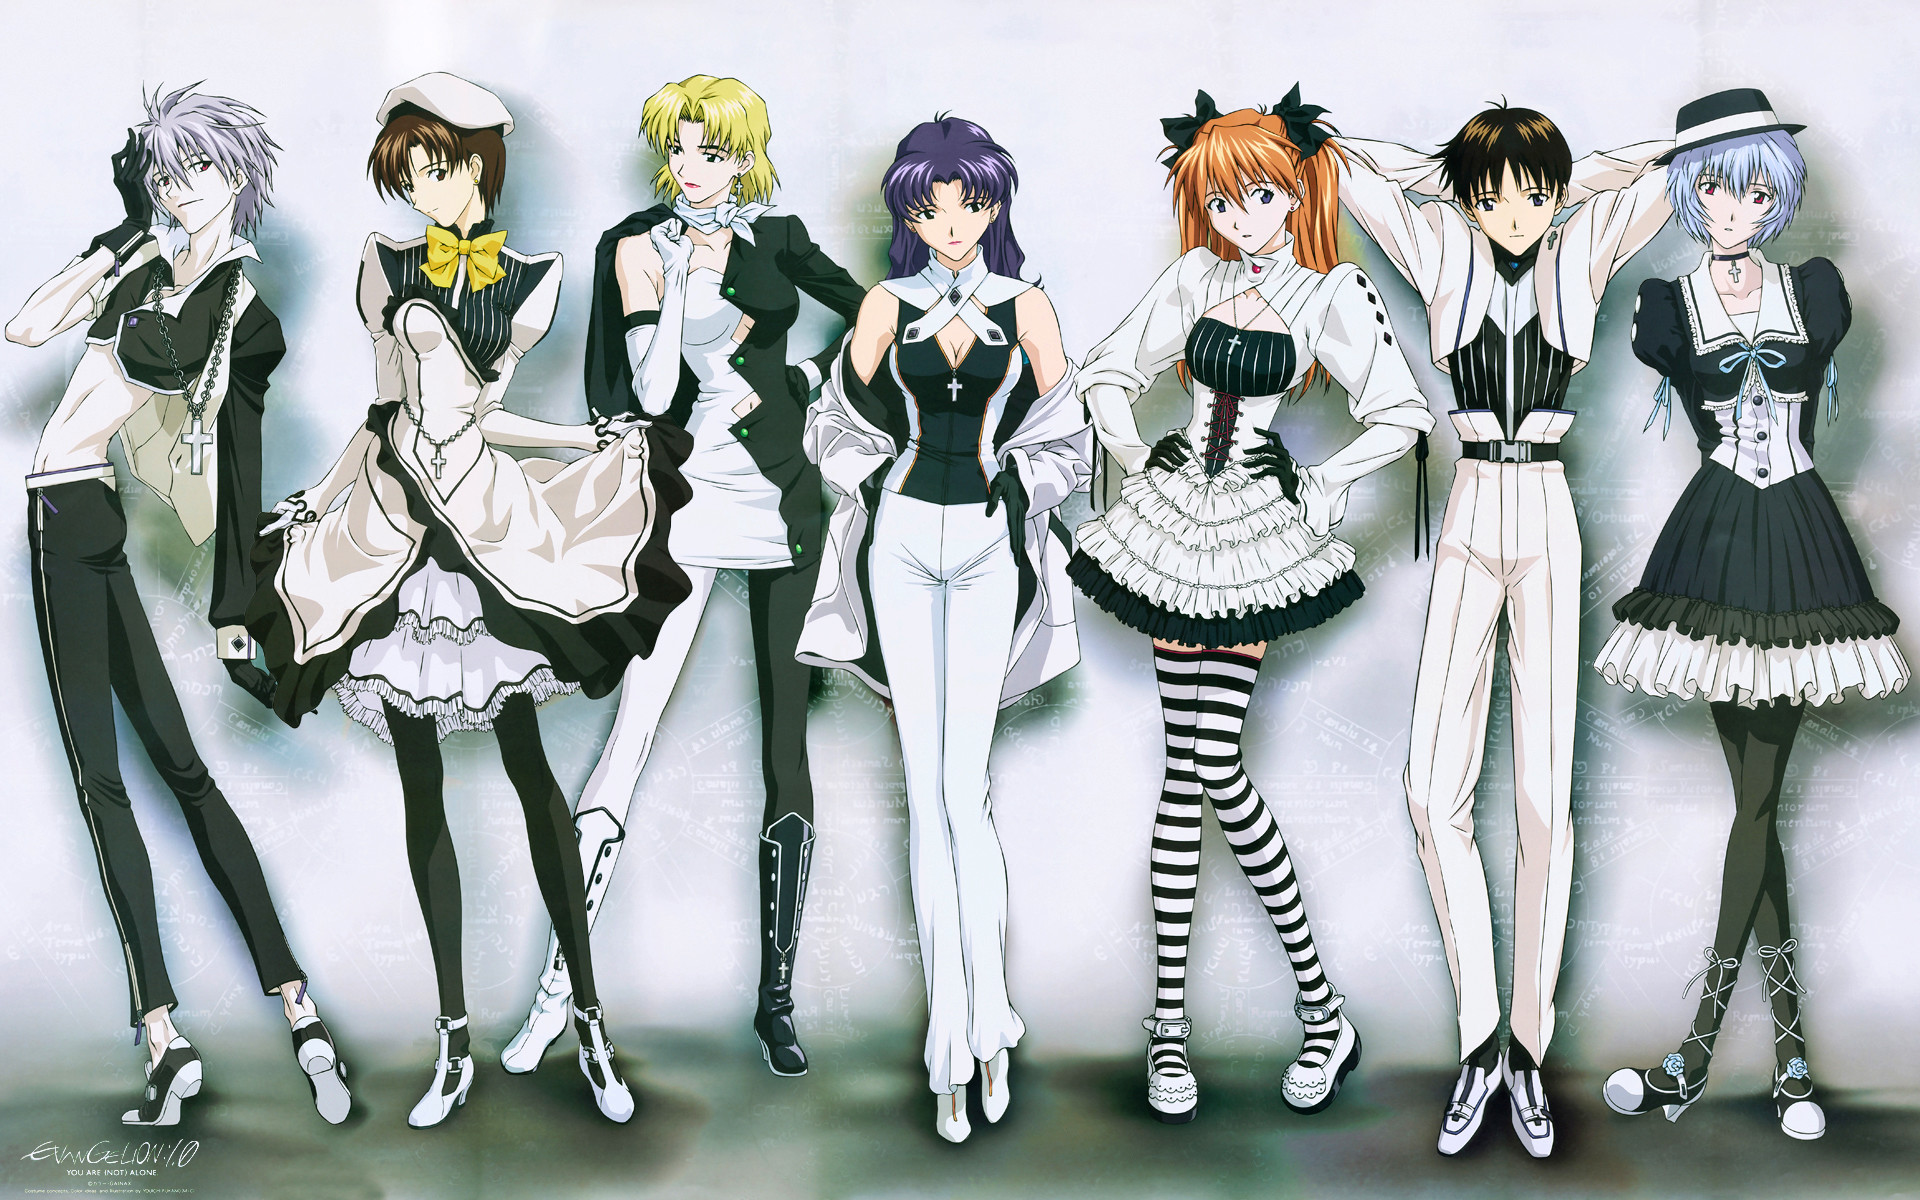 1920-1200-anime-wallpaper-hd-background-manga-full-